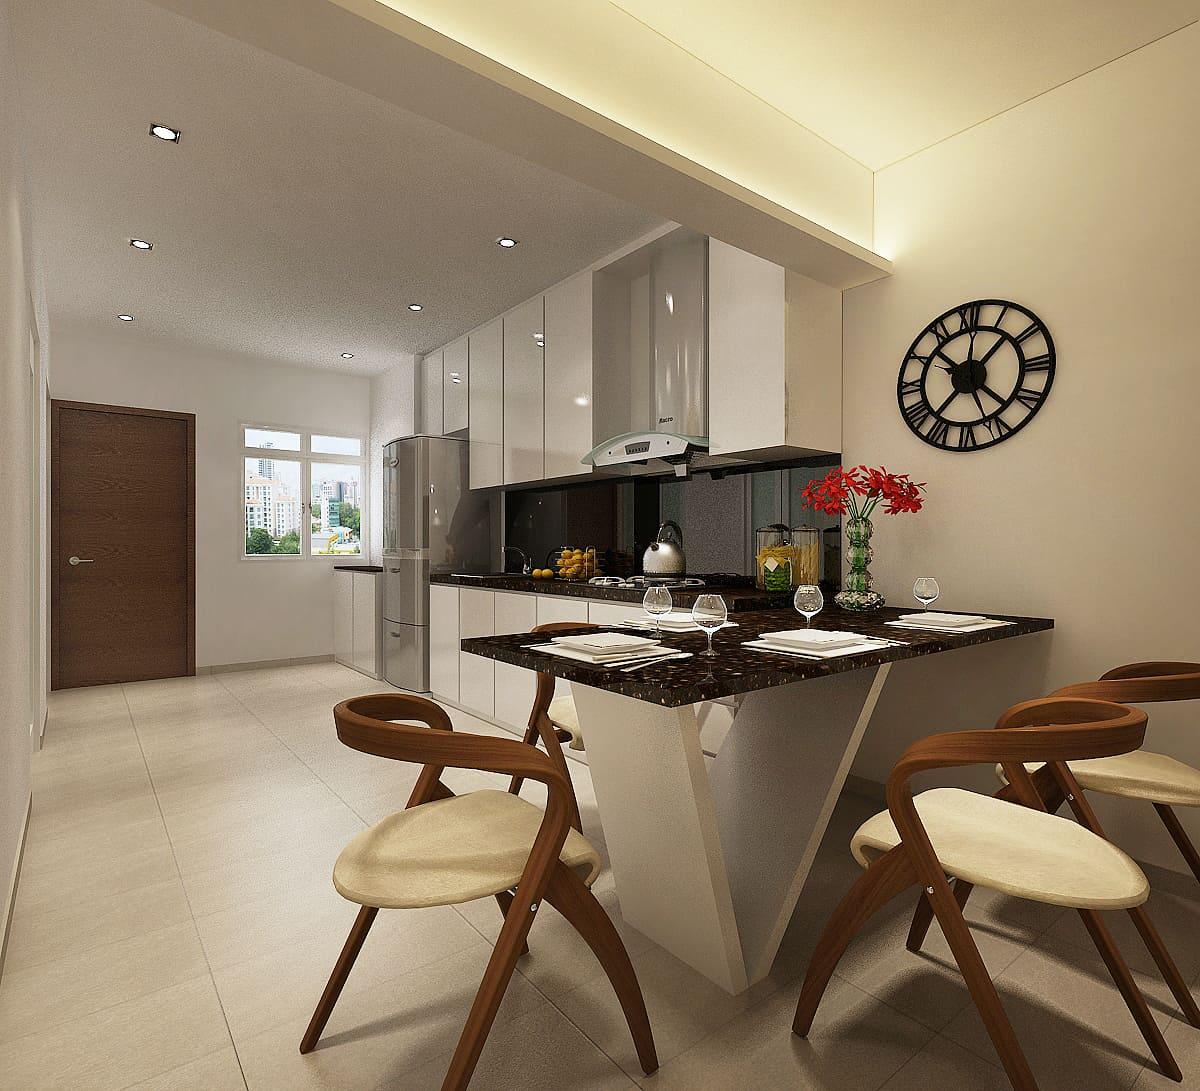 Home Design Ideas For Hdb Flats:  HDB Interior Design & Renovation Contractor Singapore